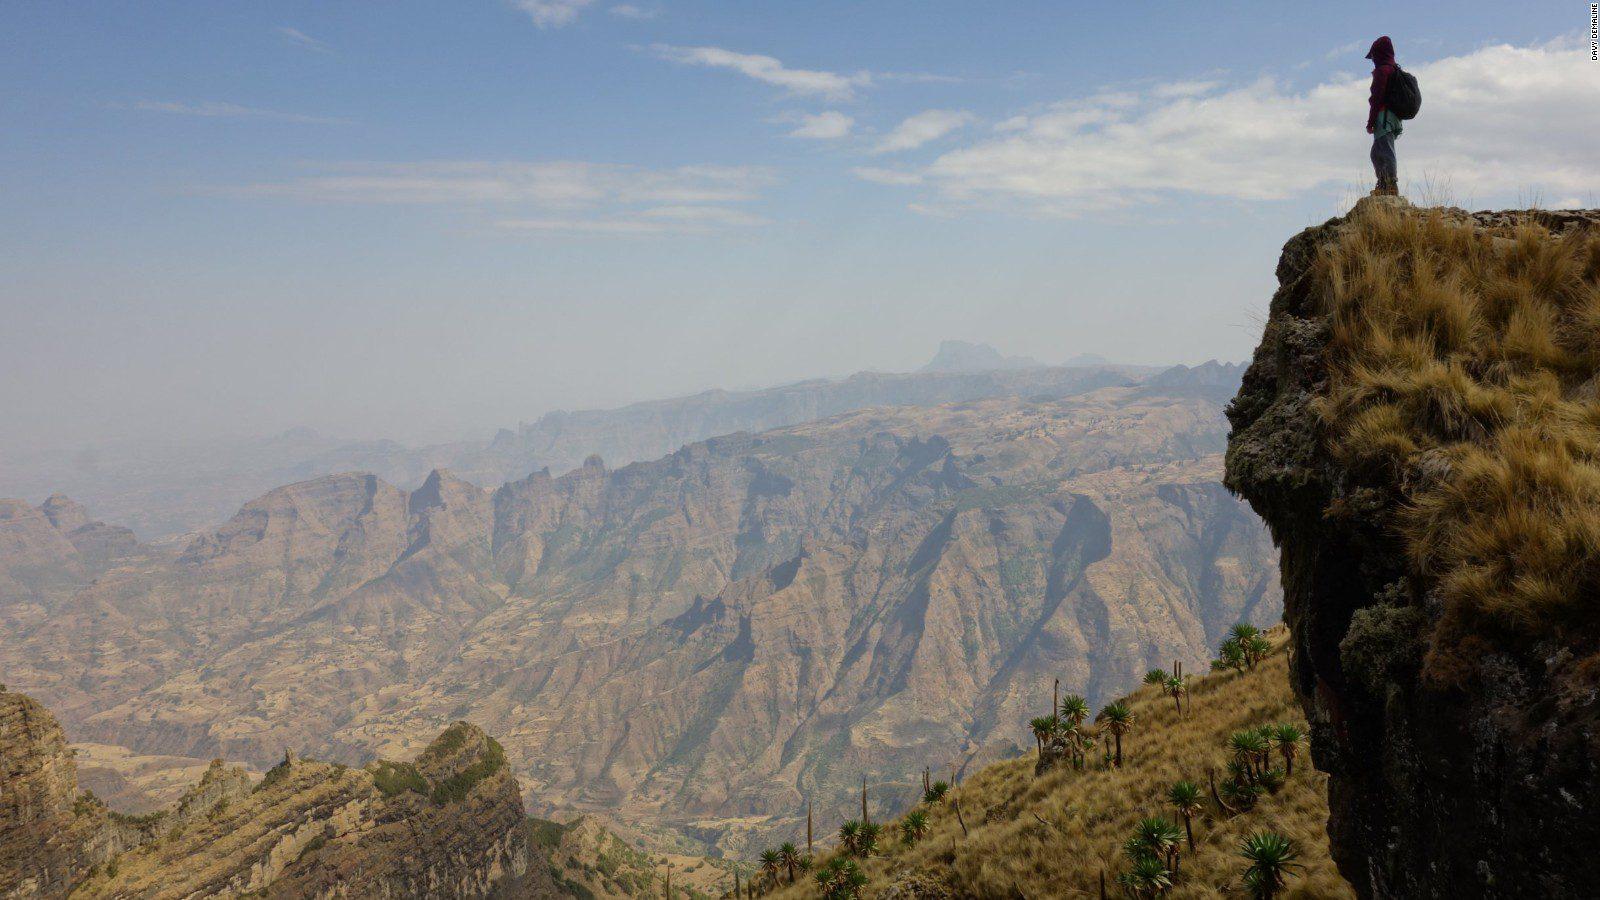 simen mountain national park